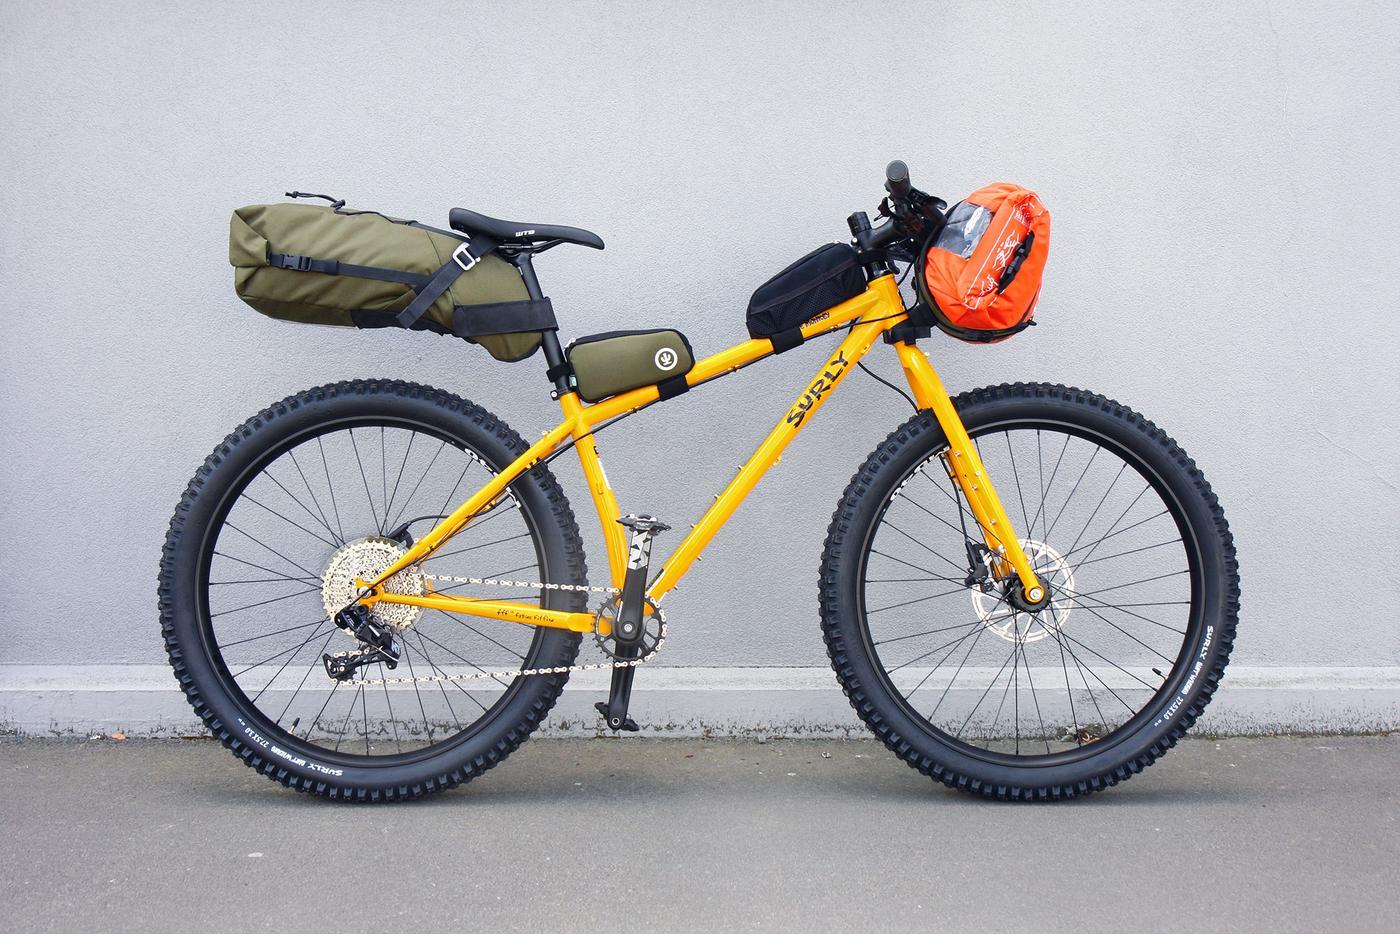 Cactus Outdoor Launches Bikepacking Range